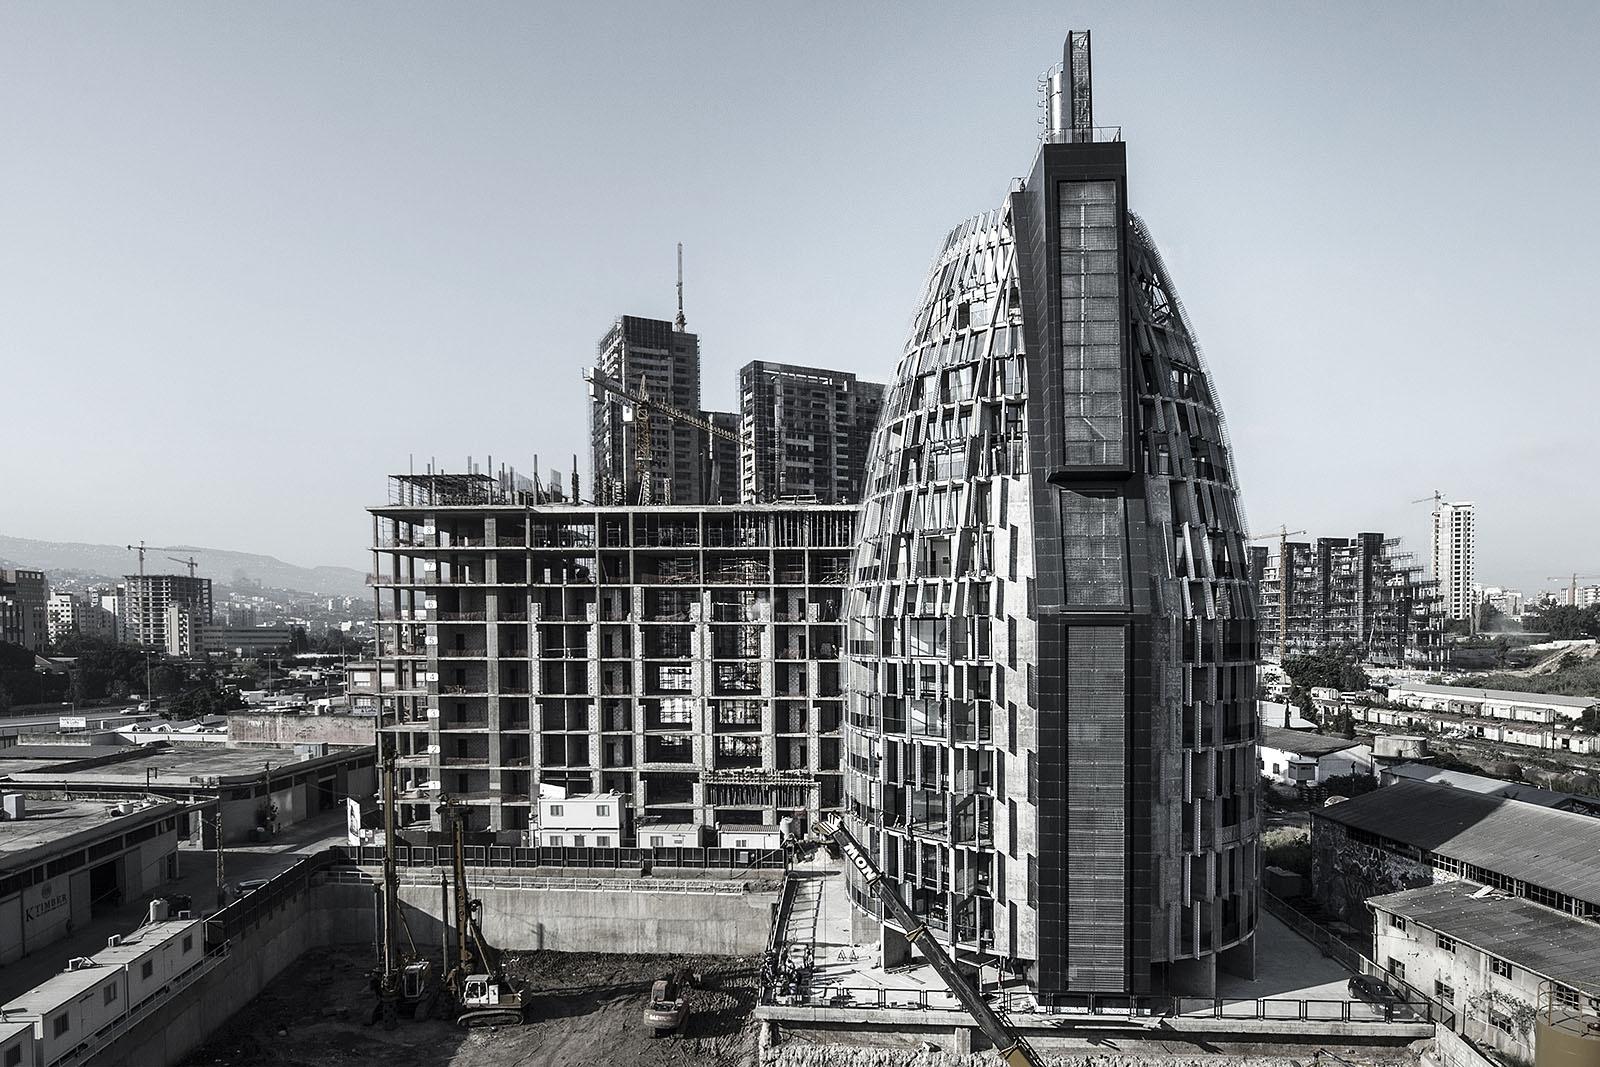 View of PLOT #4371. Architect Bernard Khoury. Photograph by IEVA SAUDARGAITE. © DW5 BERNARD KHOURY.